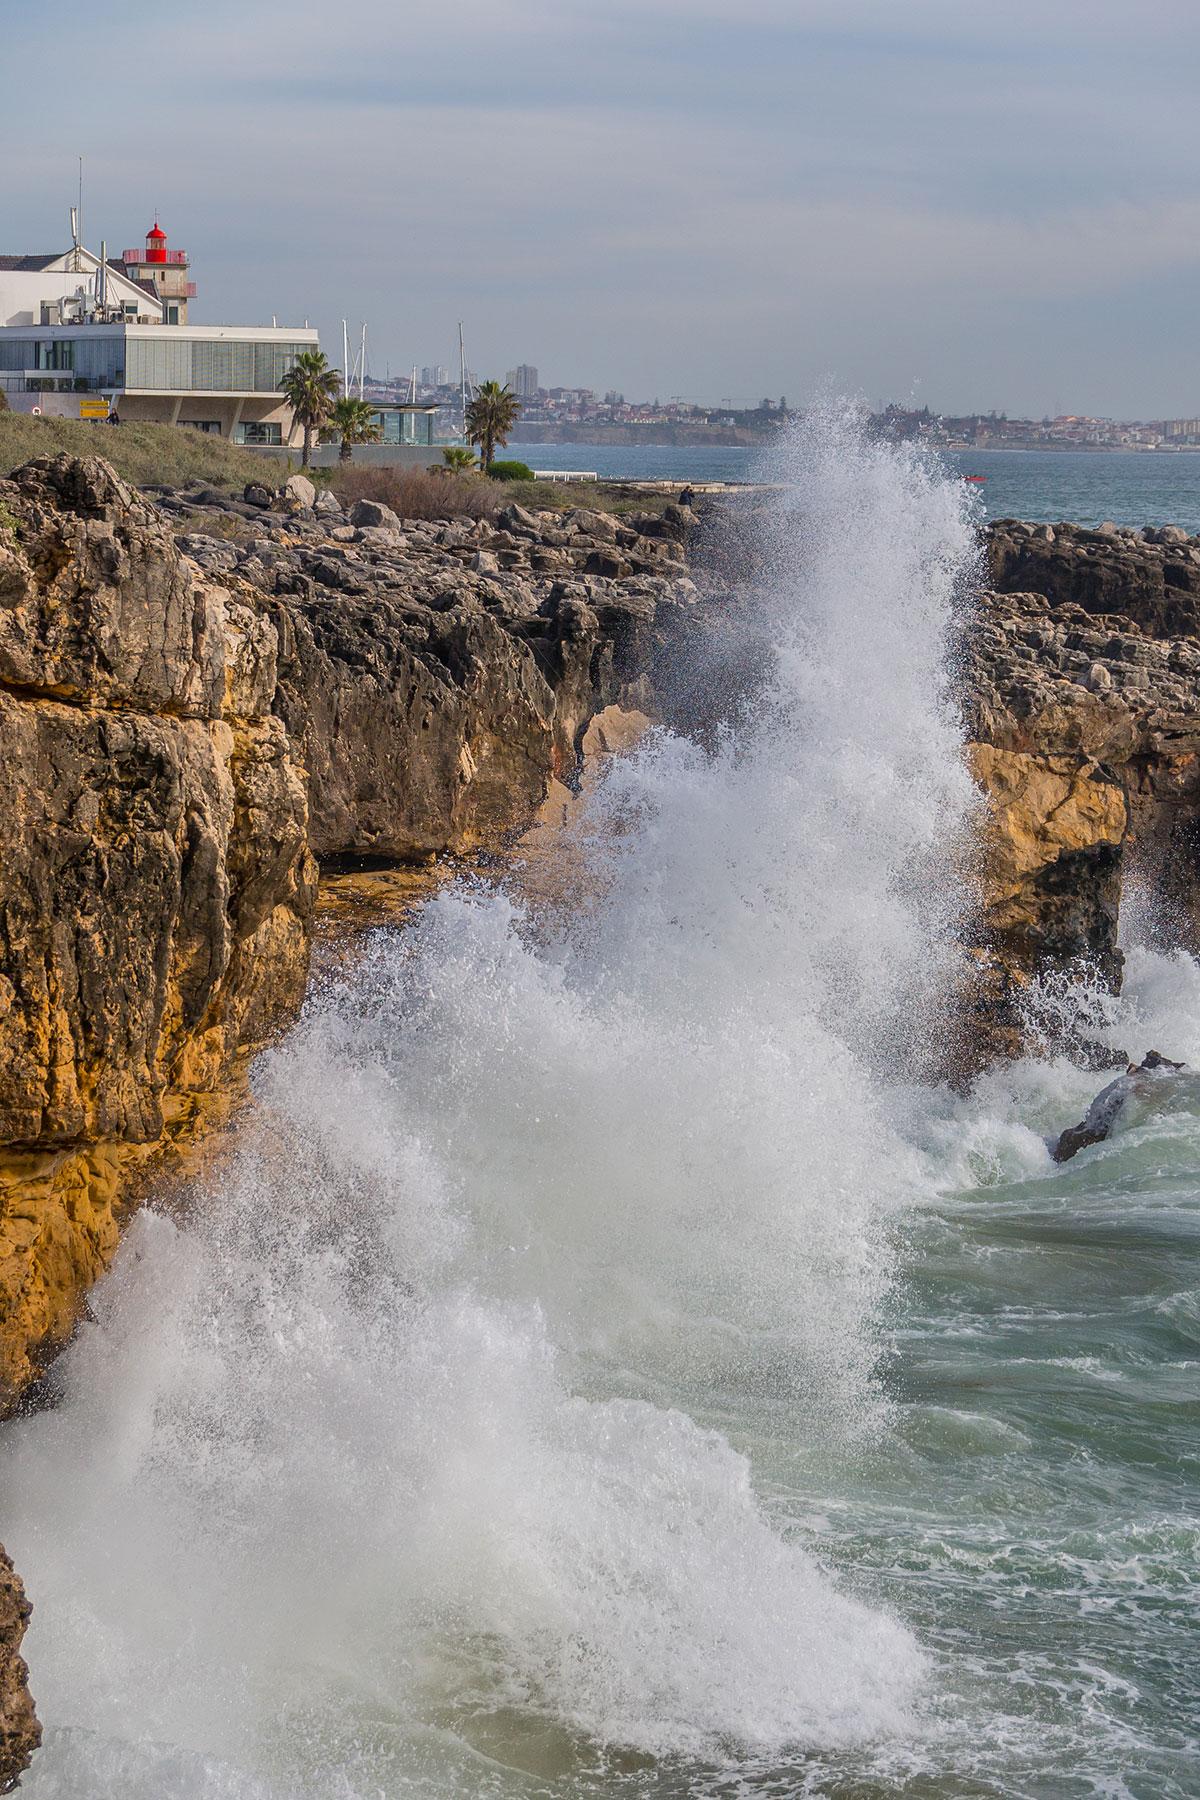 Portugal, Cascais, Boca do Inferno, Wellen und Gischt